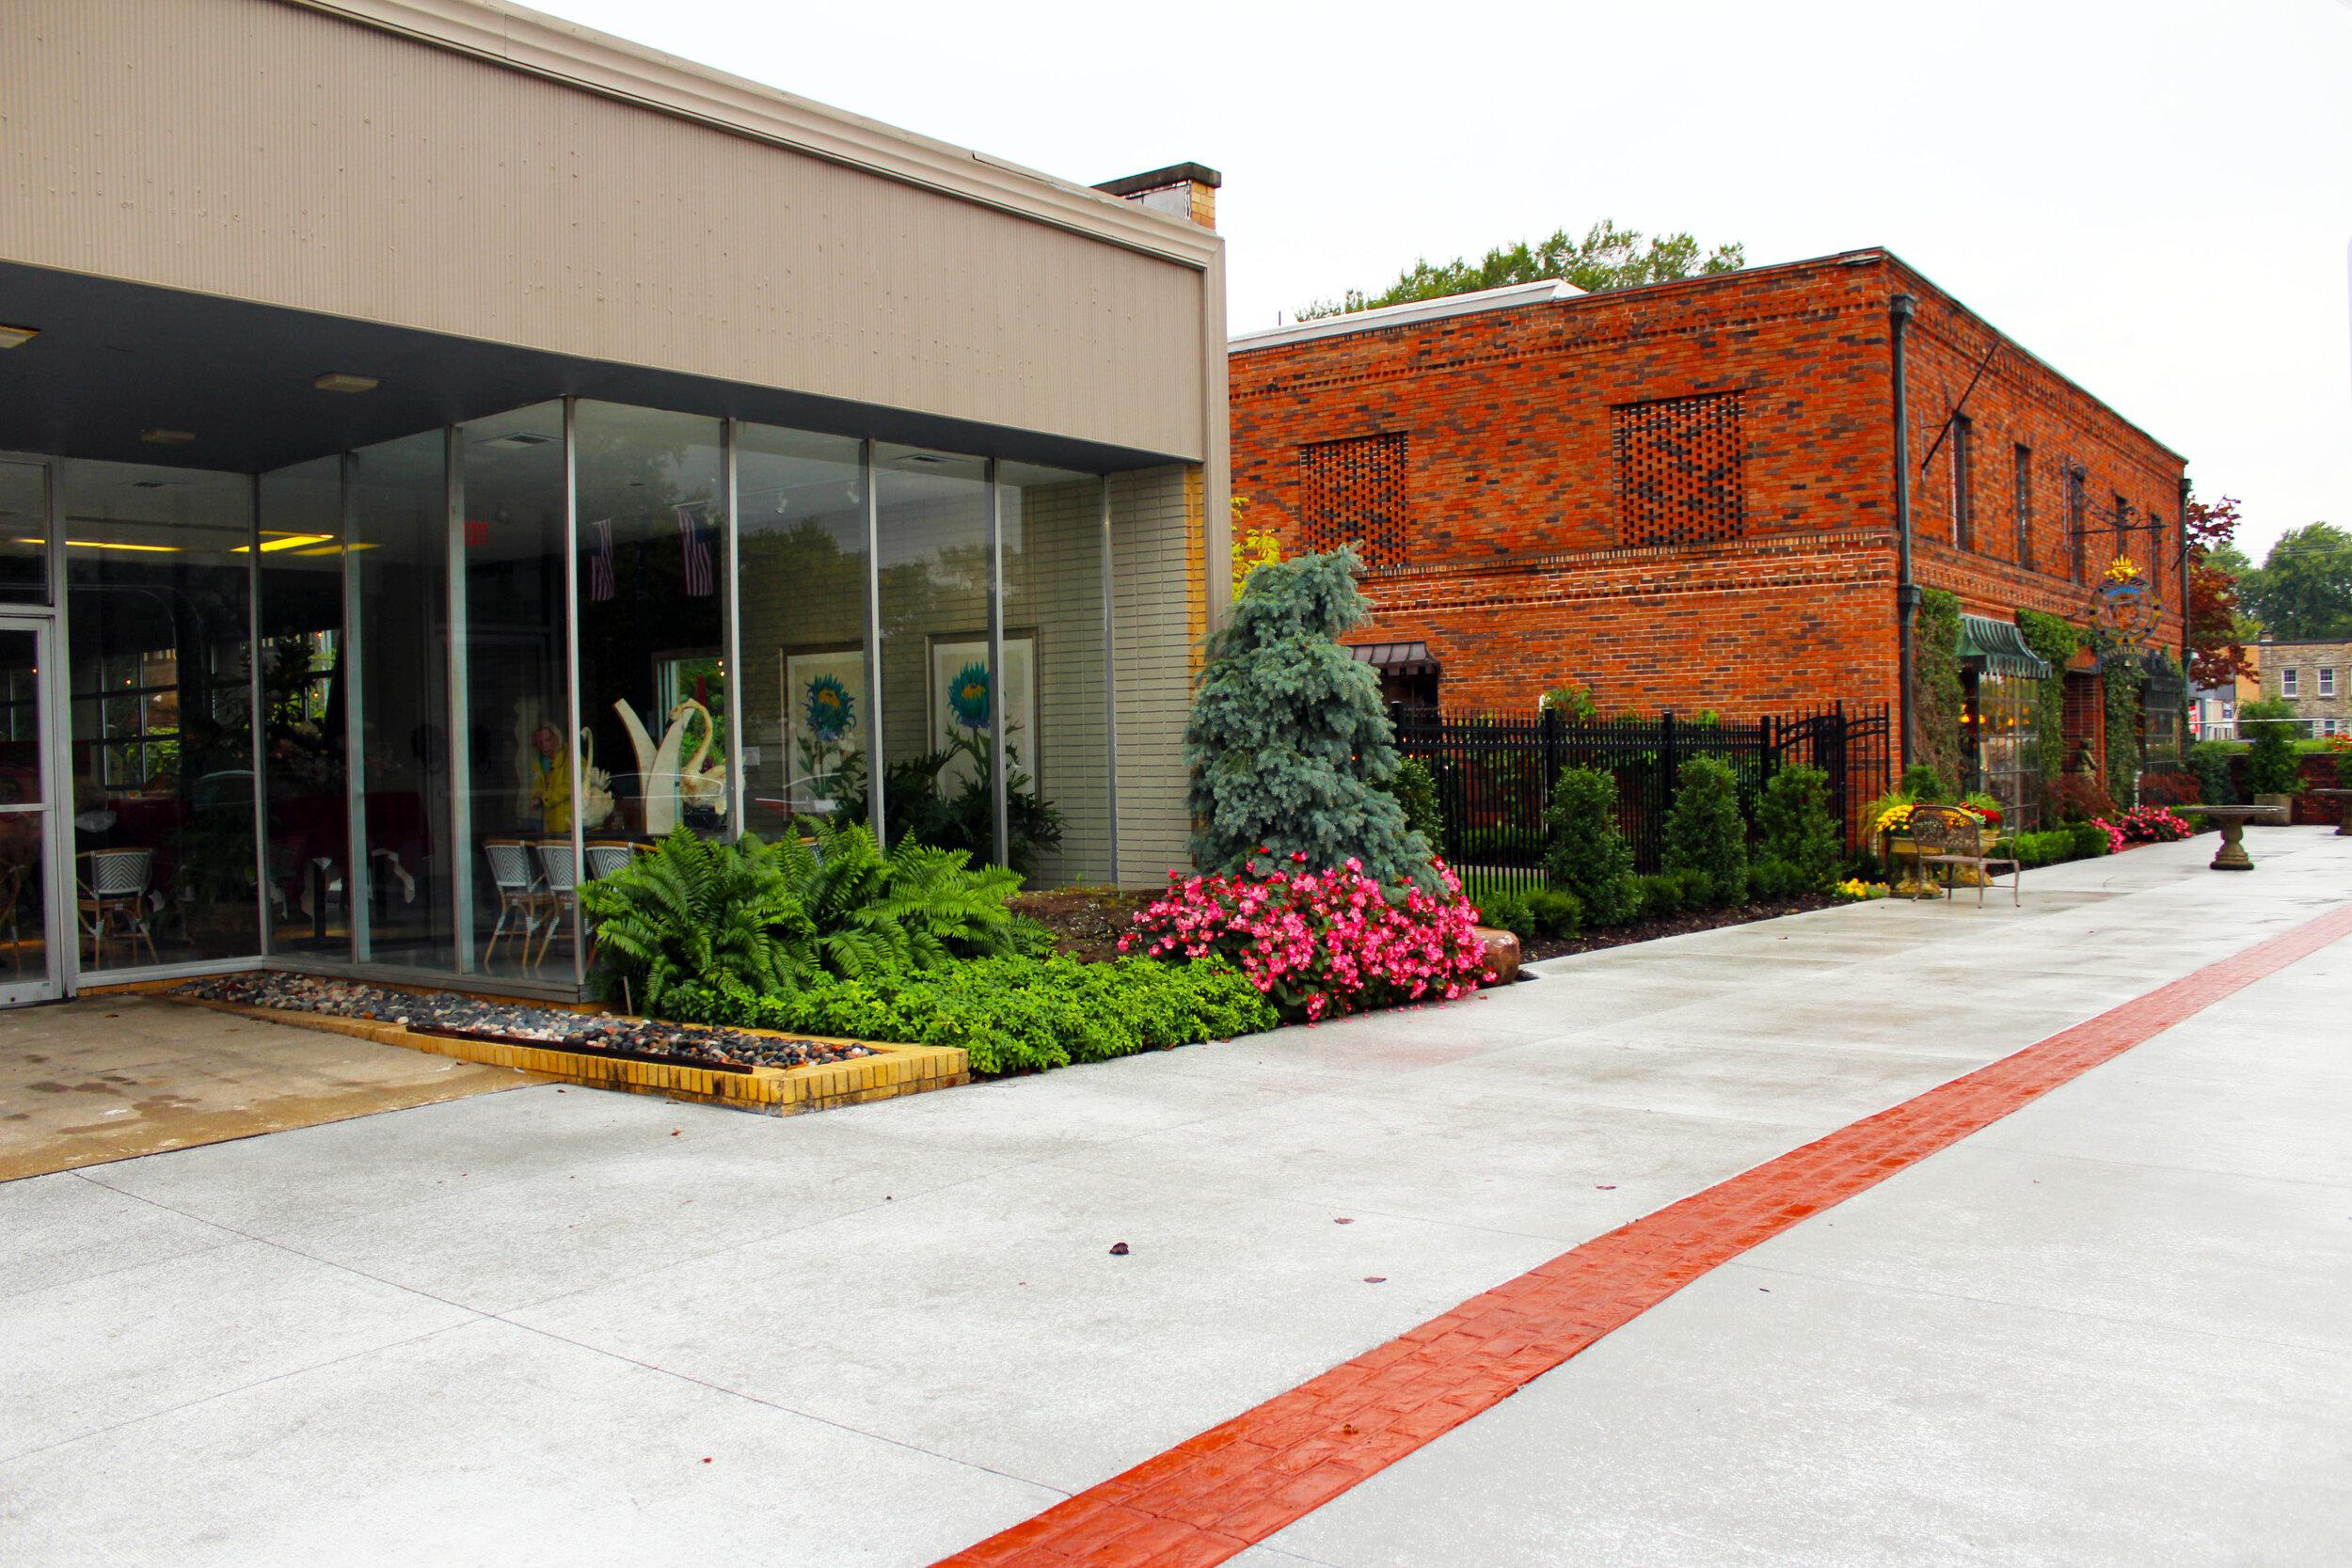 Swan-Dive-Event-Center-Upscale-Vivilore-Restaurant-Independence-Missouri-by-Vivilore.jpg